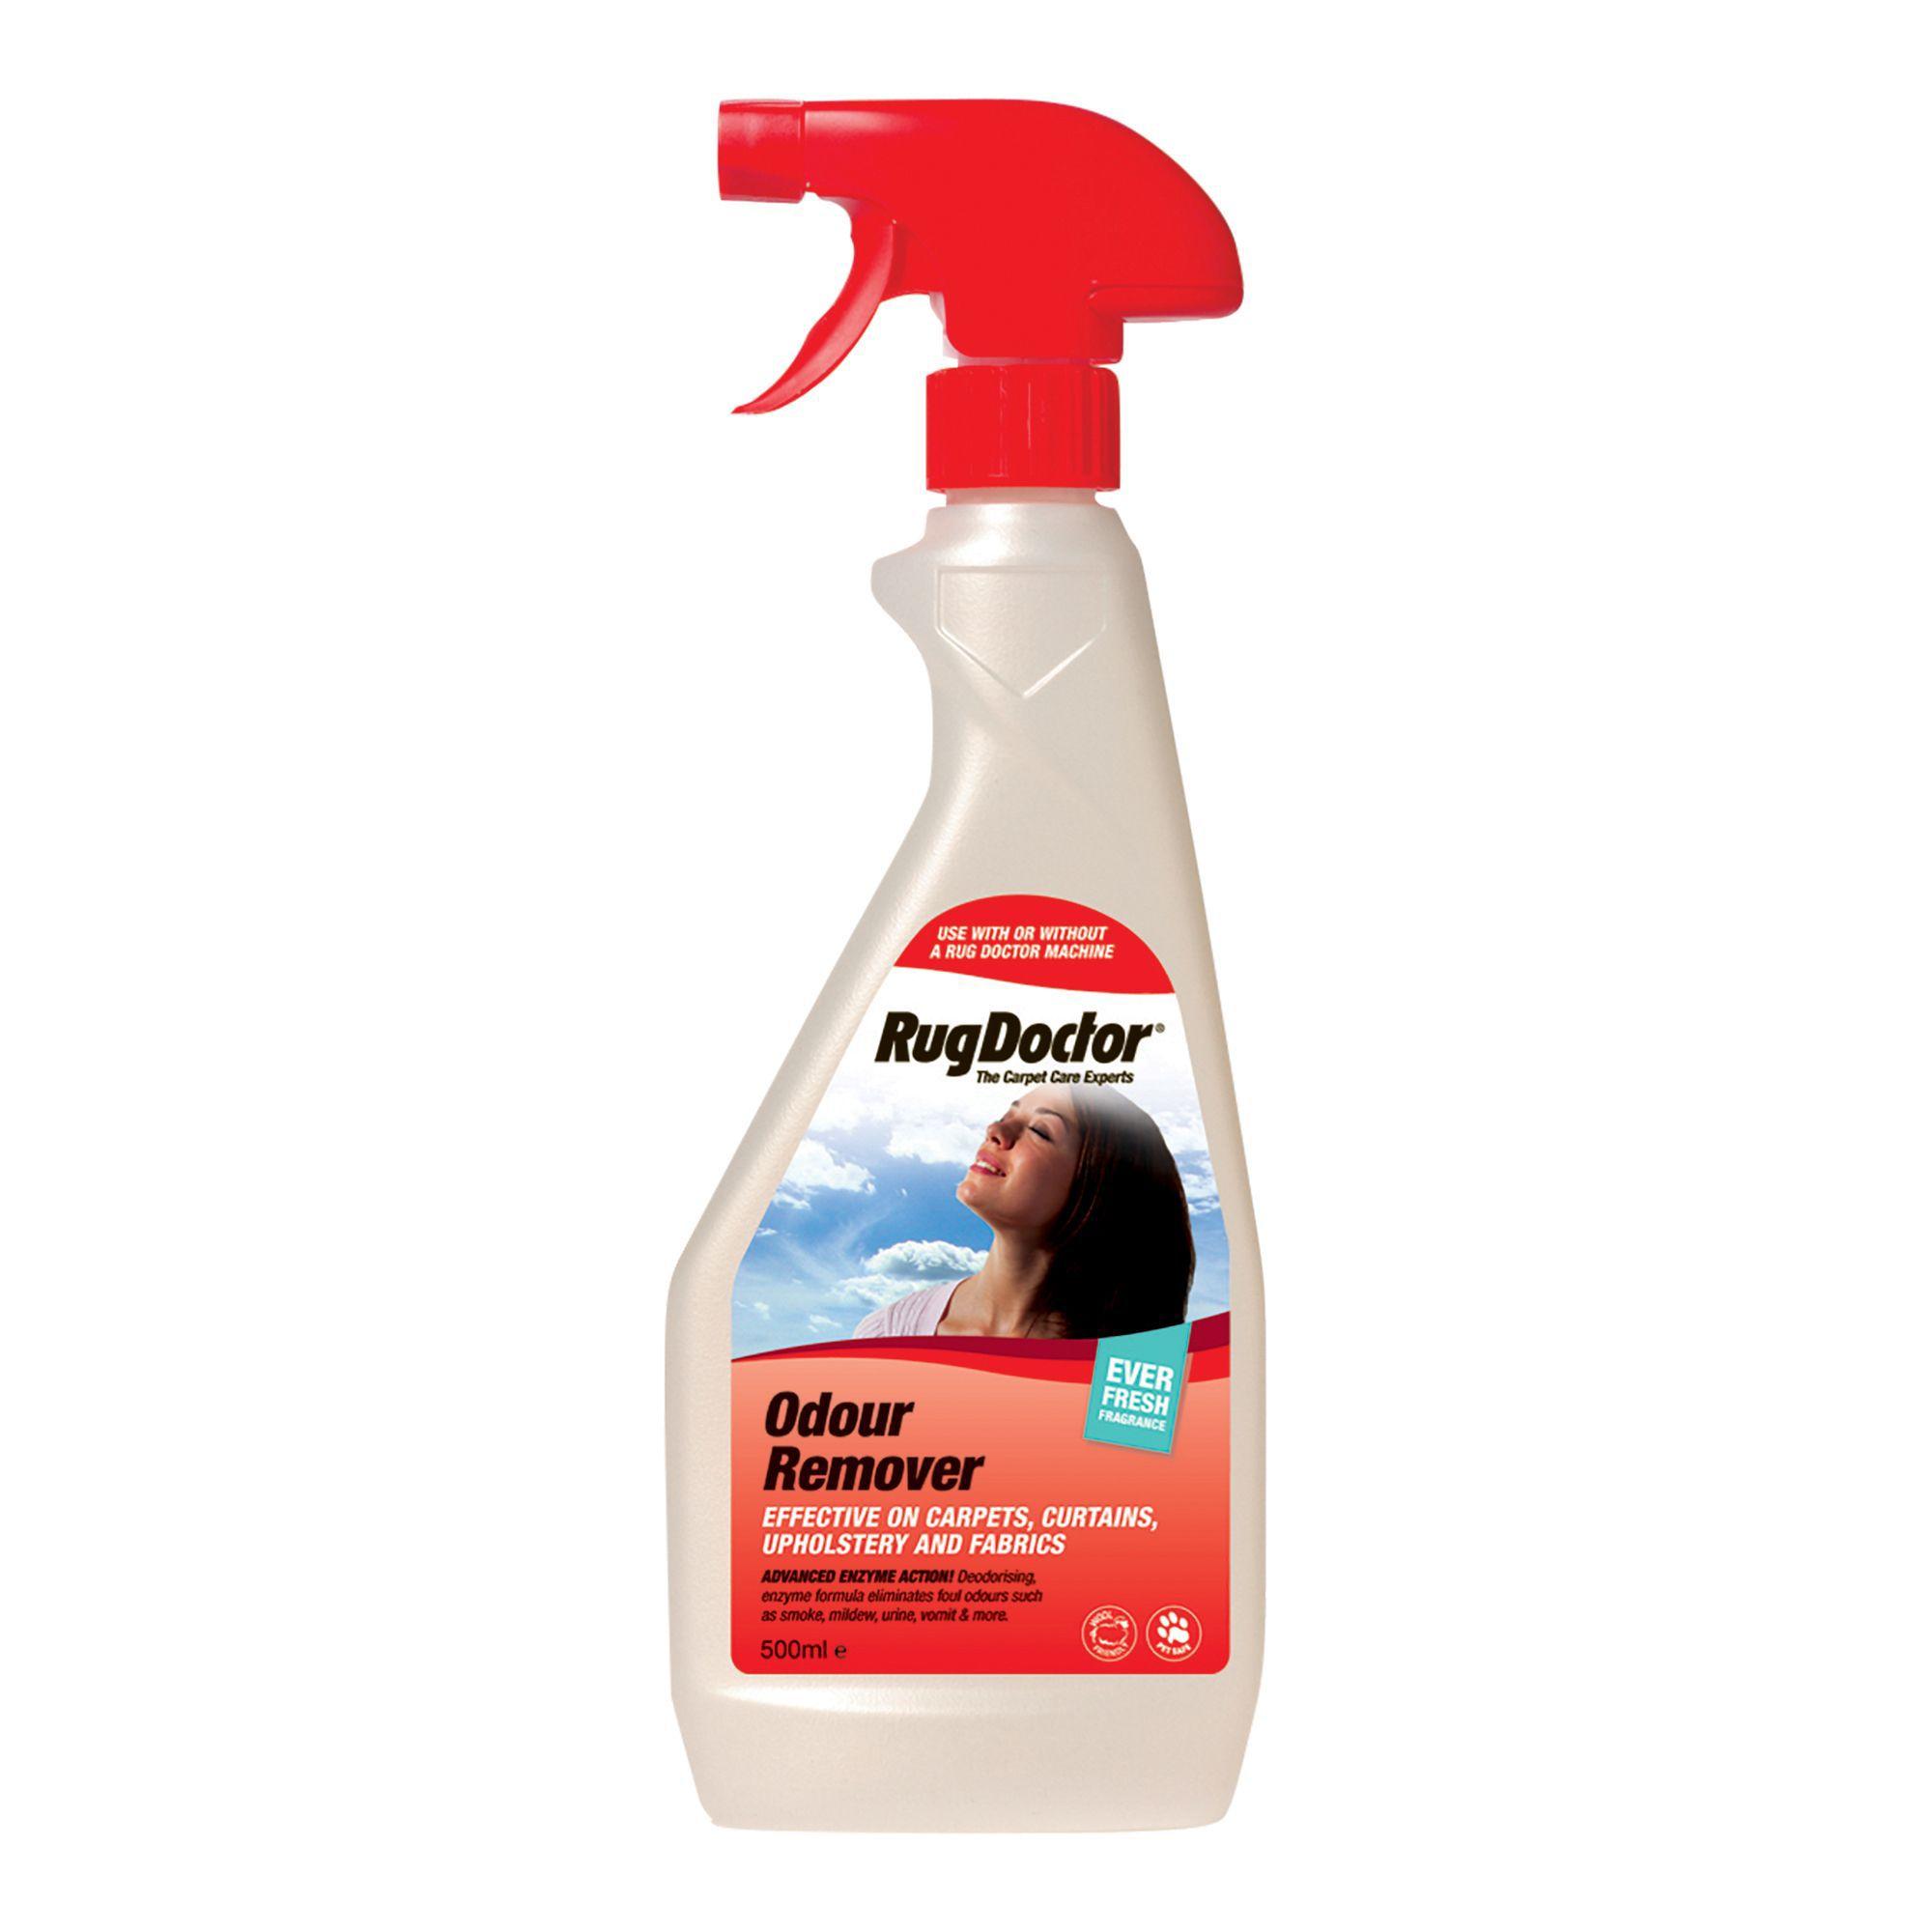 Rug Doctor Odour Remover Trigger Spray, 500 Ml